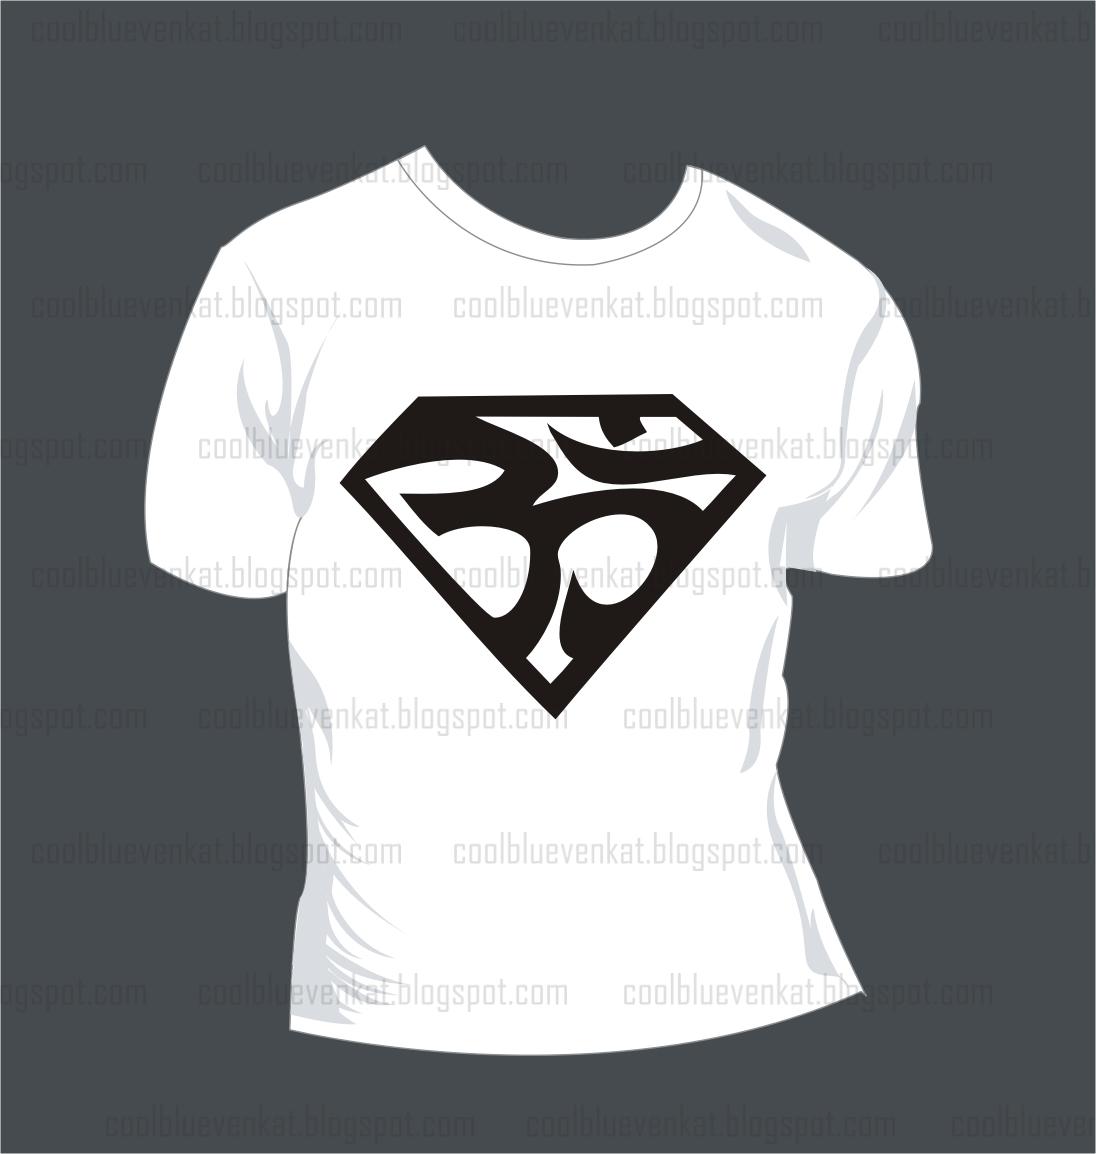 Cool T Shirt Design Ideas Home Design Ideas